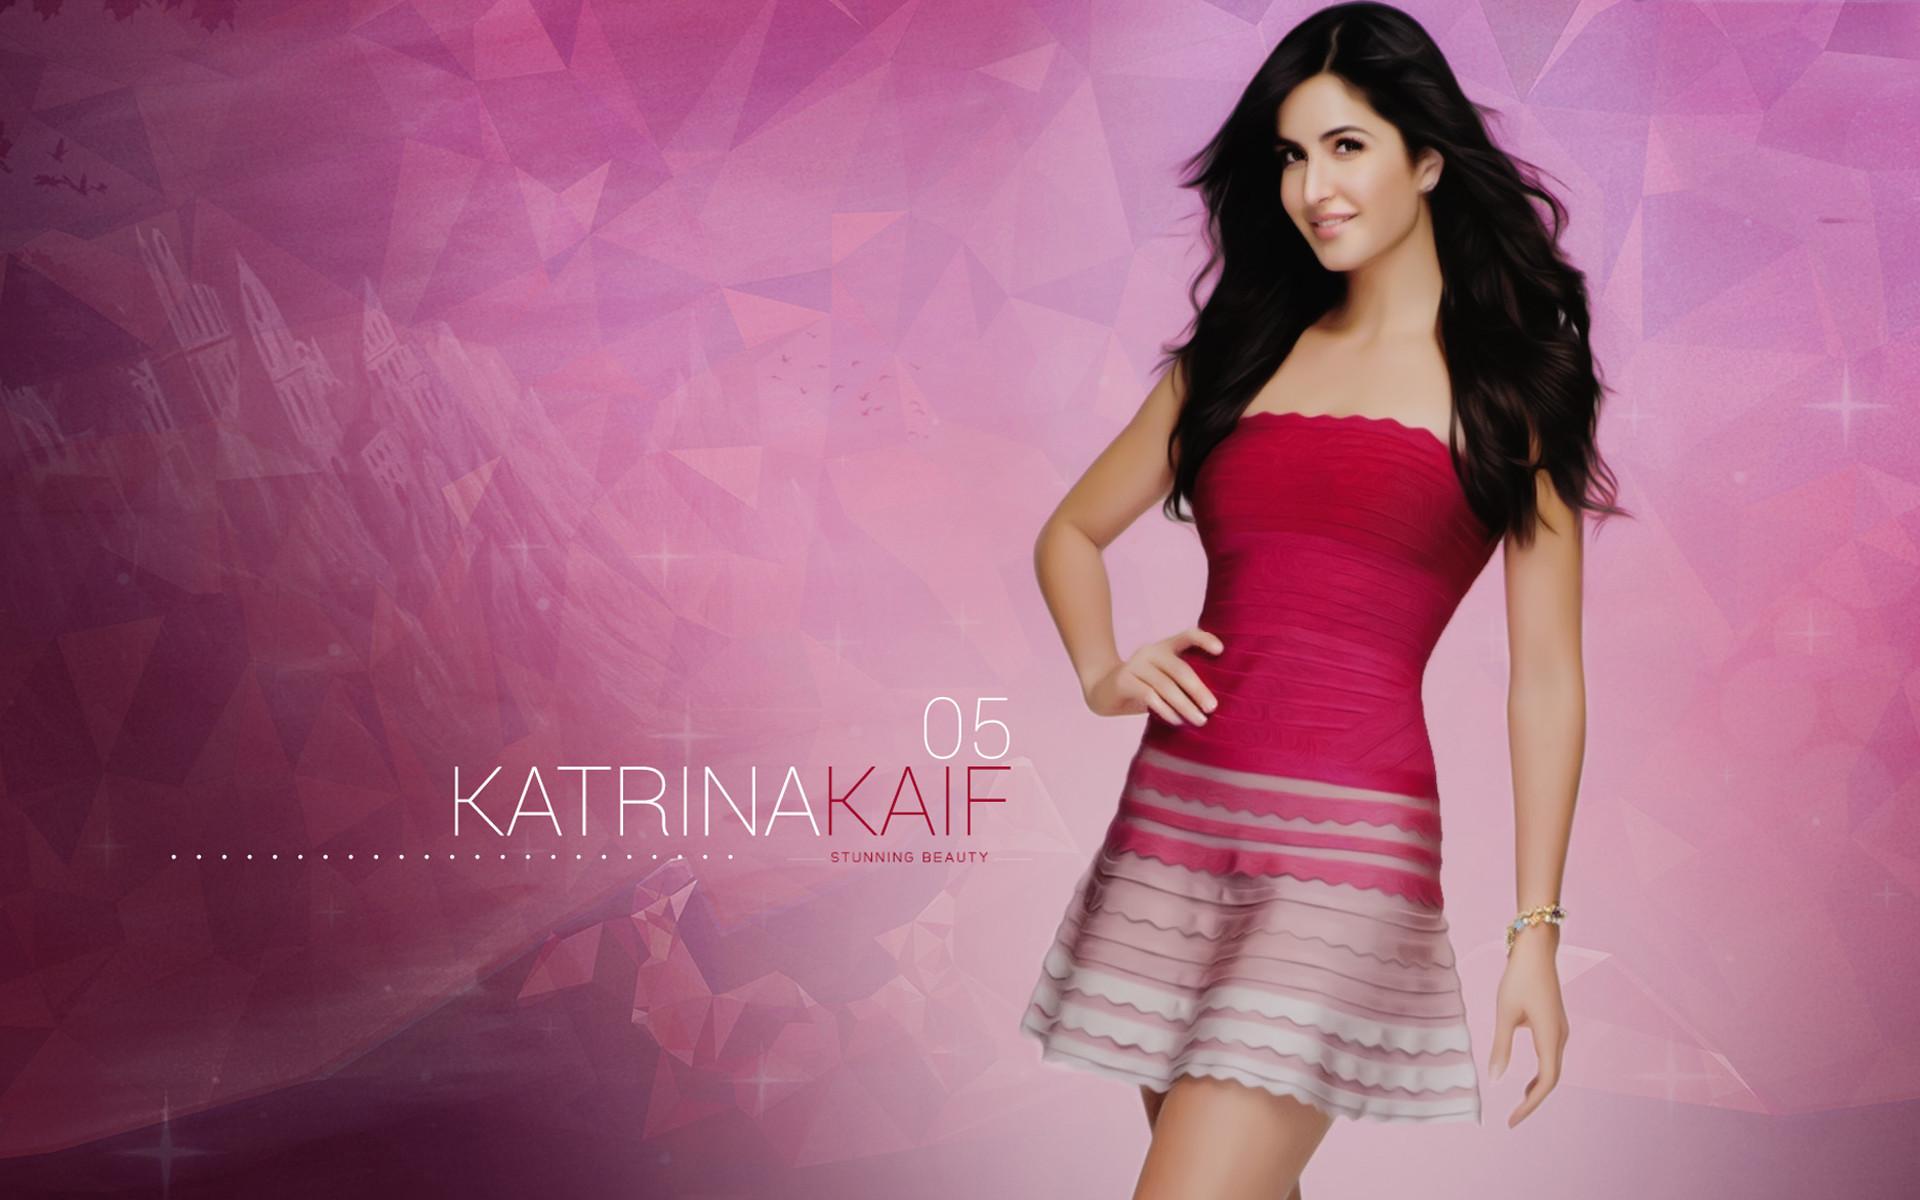 katrina kaif hd wallpapers 1080p ·①